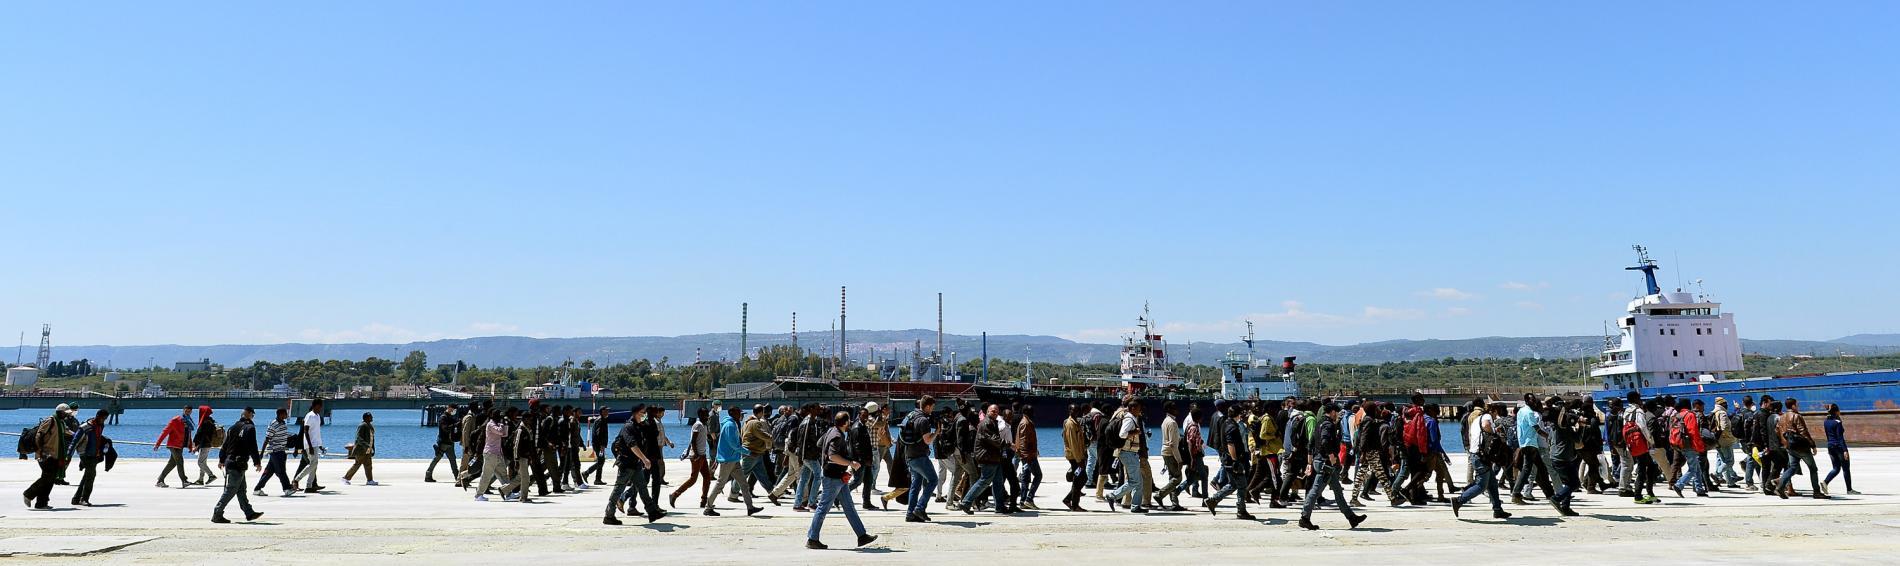 Ankommende Flüchtlinge am Hafen